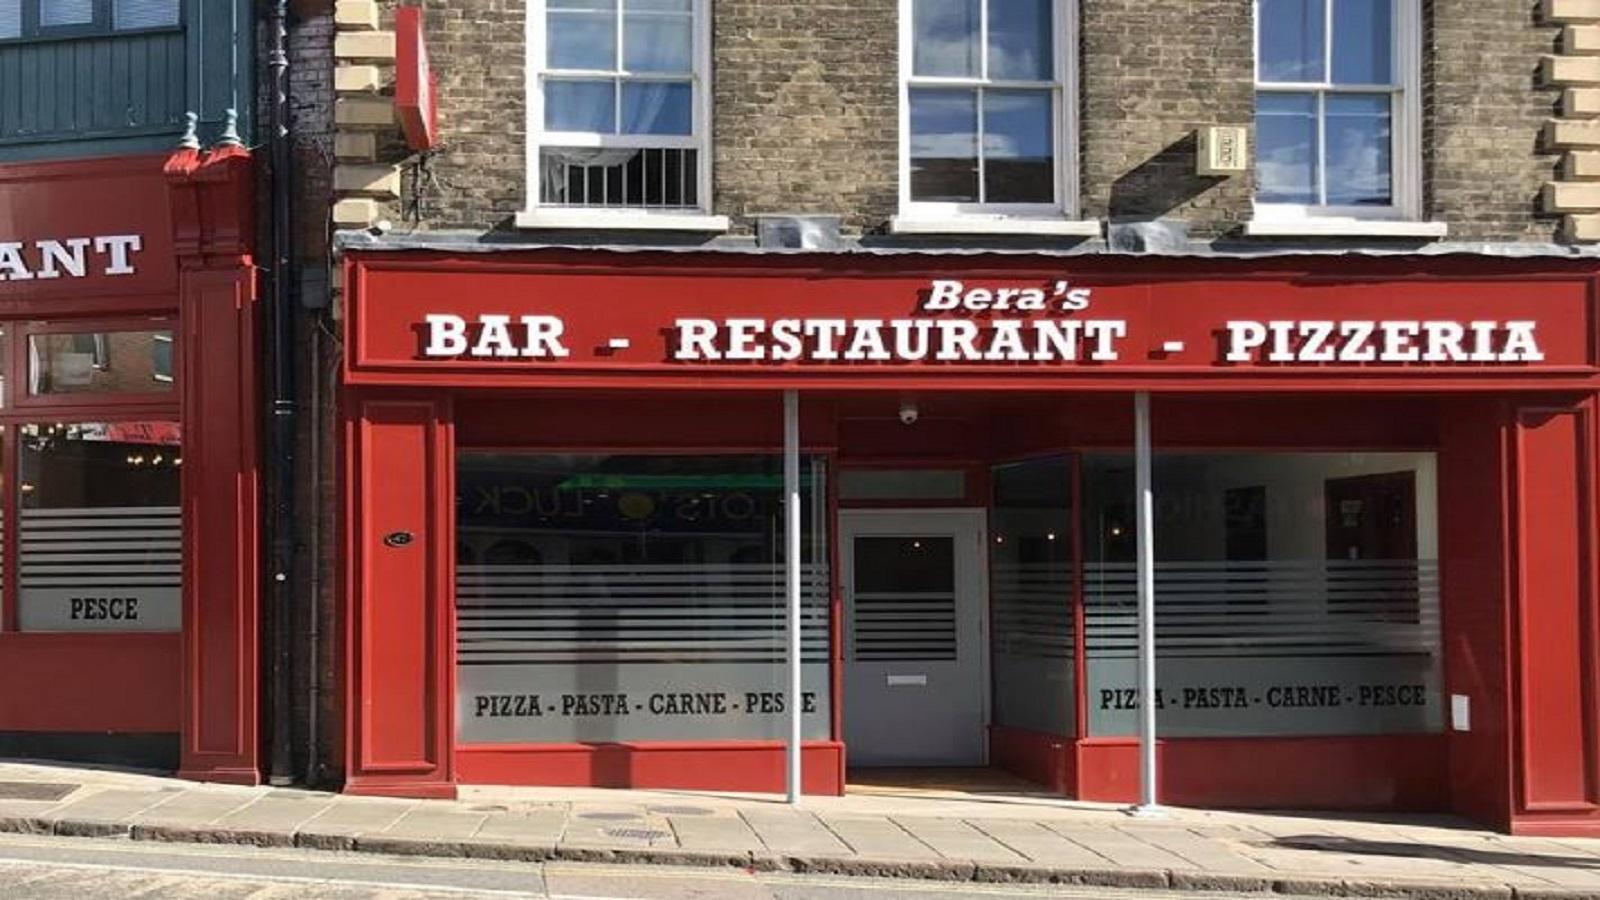 Bera's Restaurant